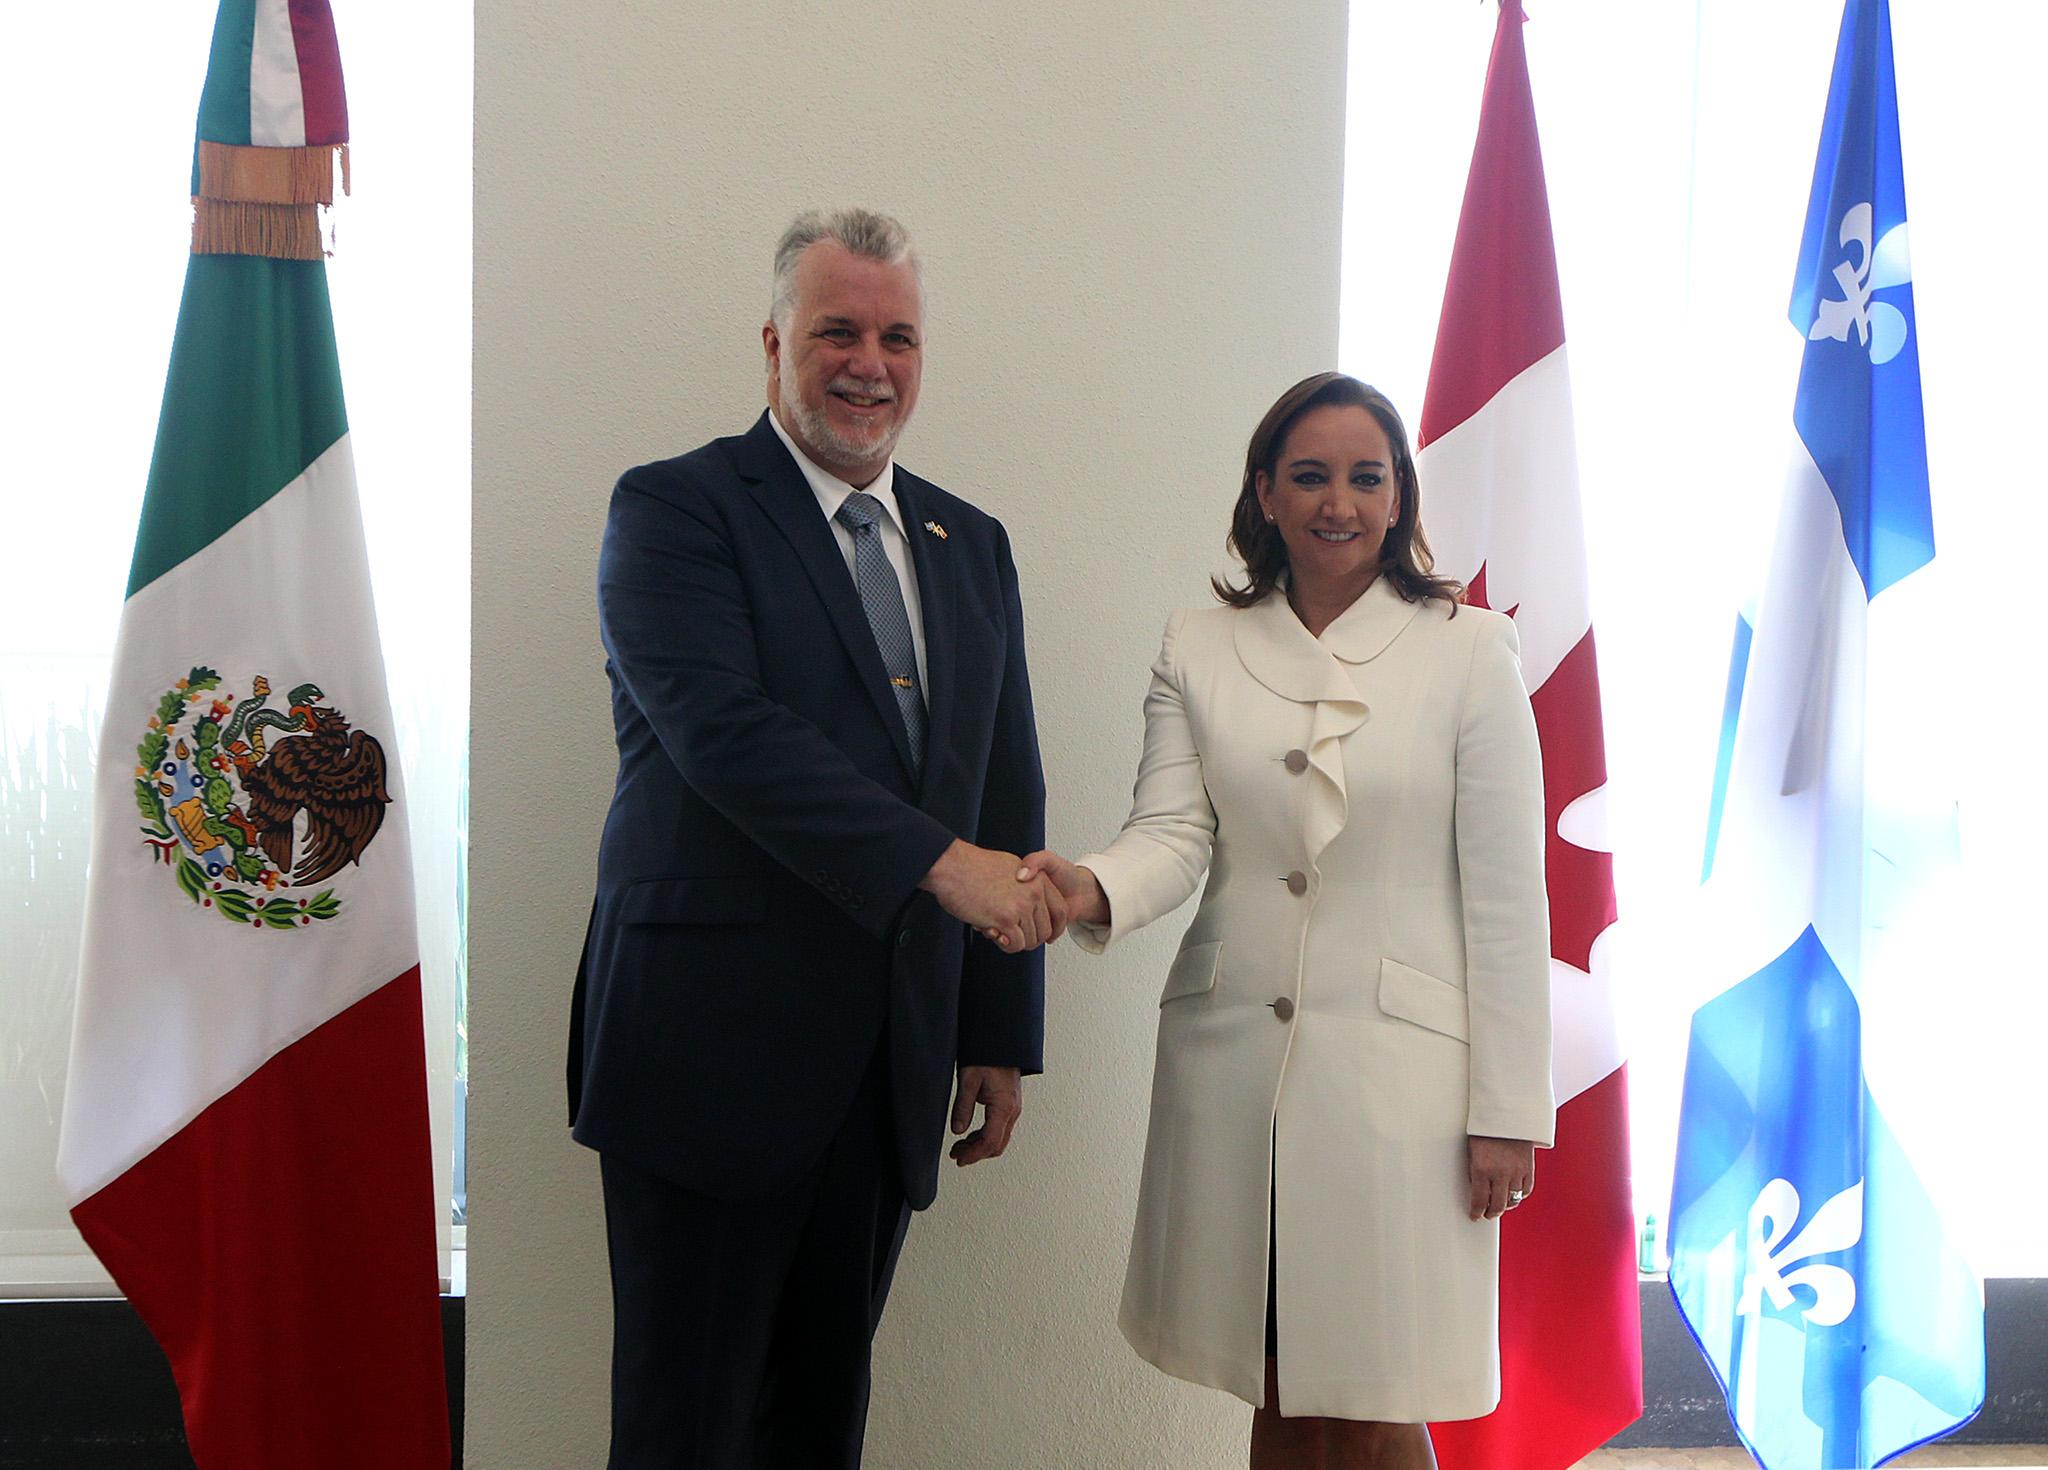 FOTO 1 Canciller Claudia Ruiz Massieu con el Primer Ministro de la Provincia de Quebec  Philippe Couillard.jpg